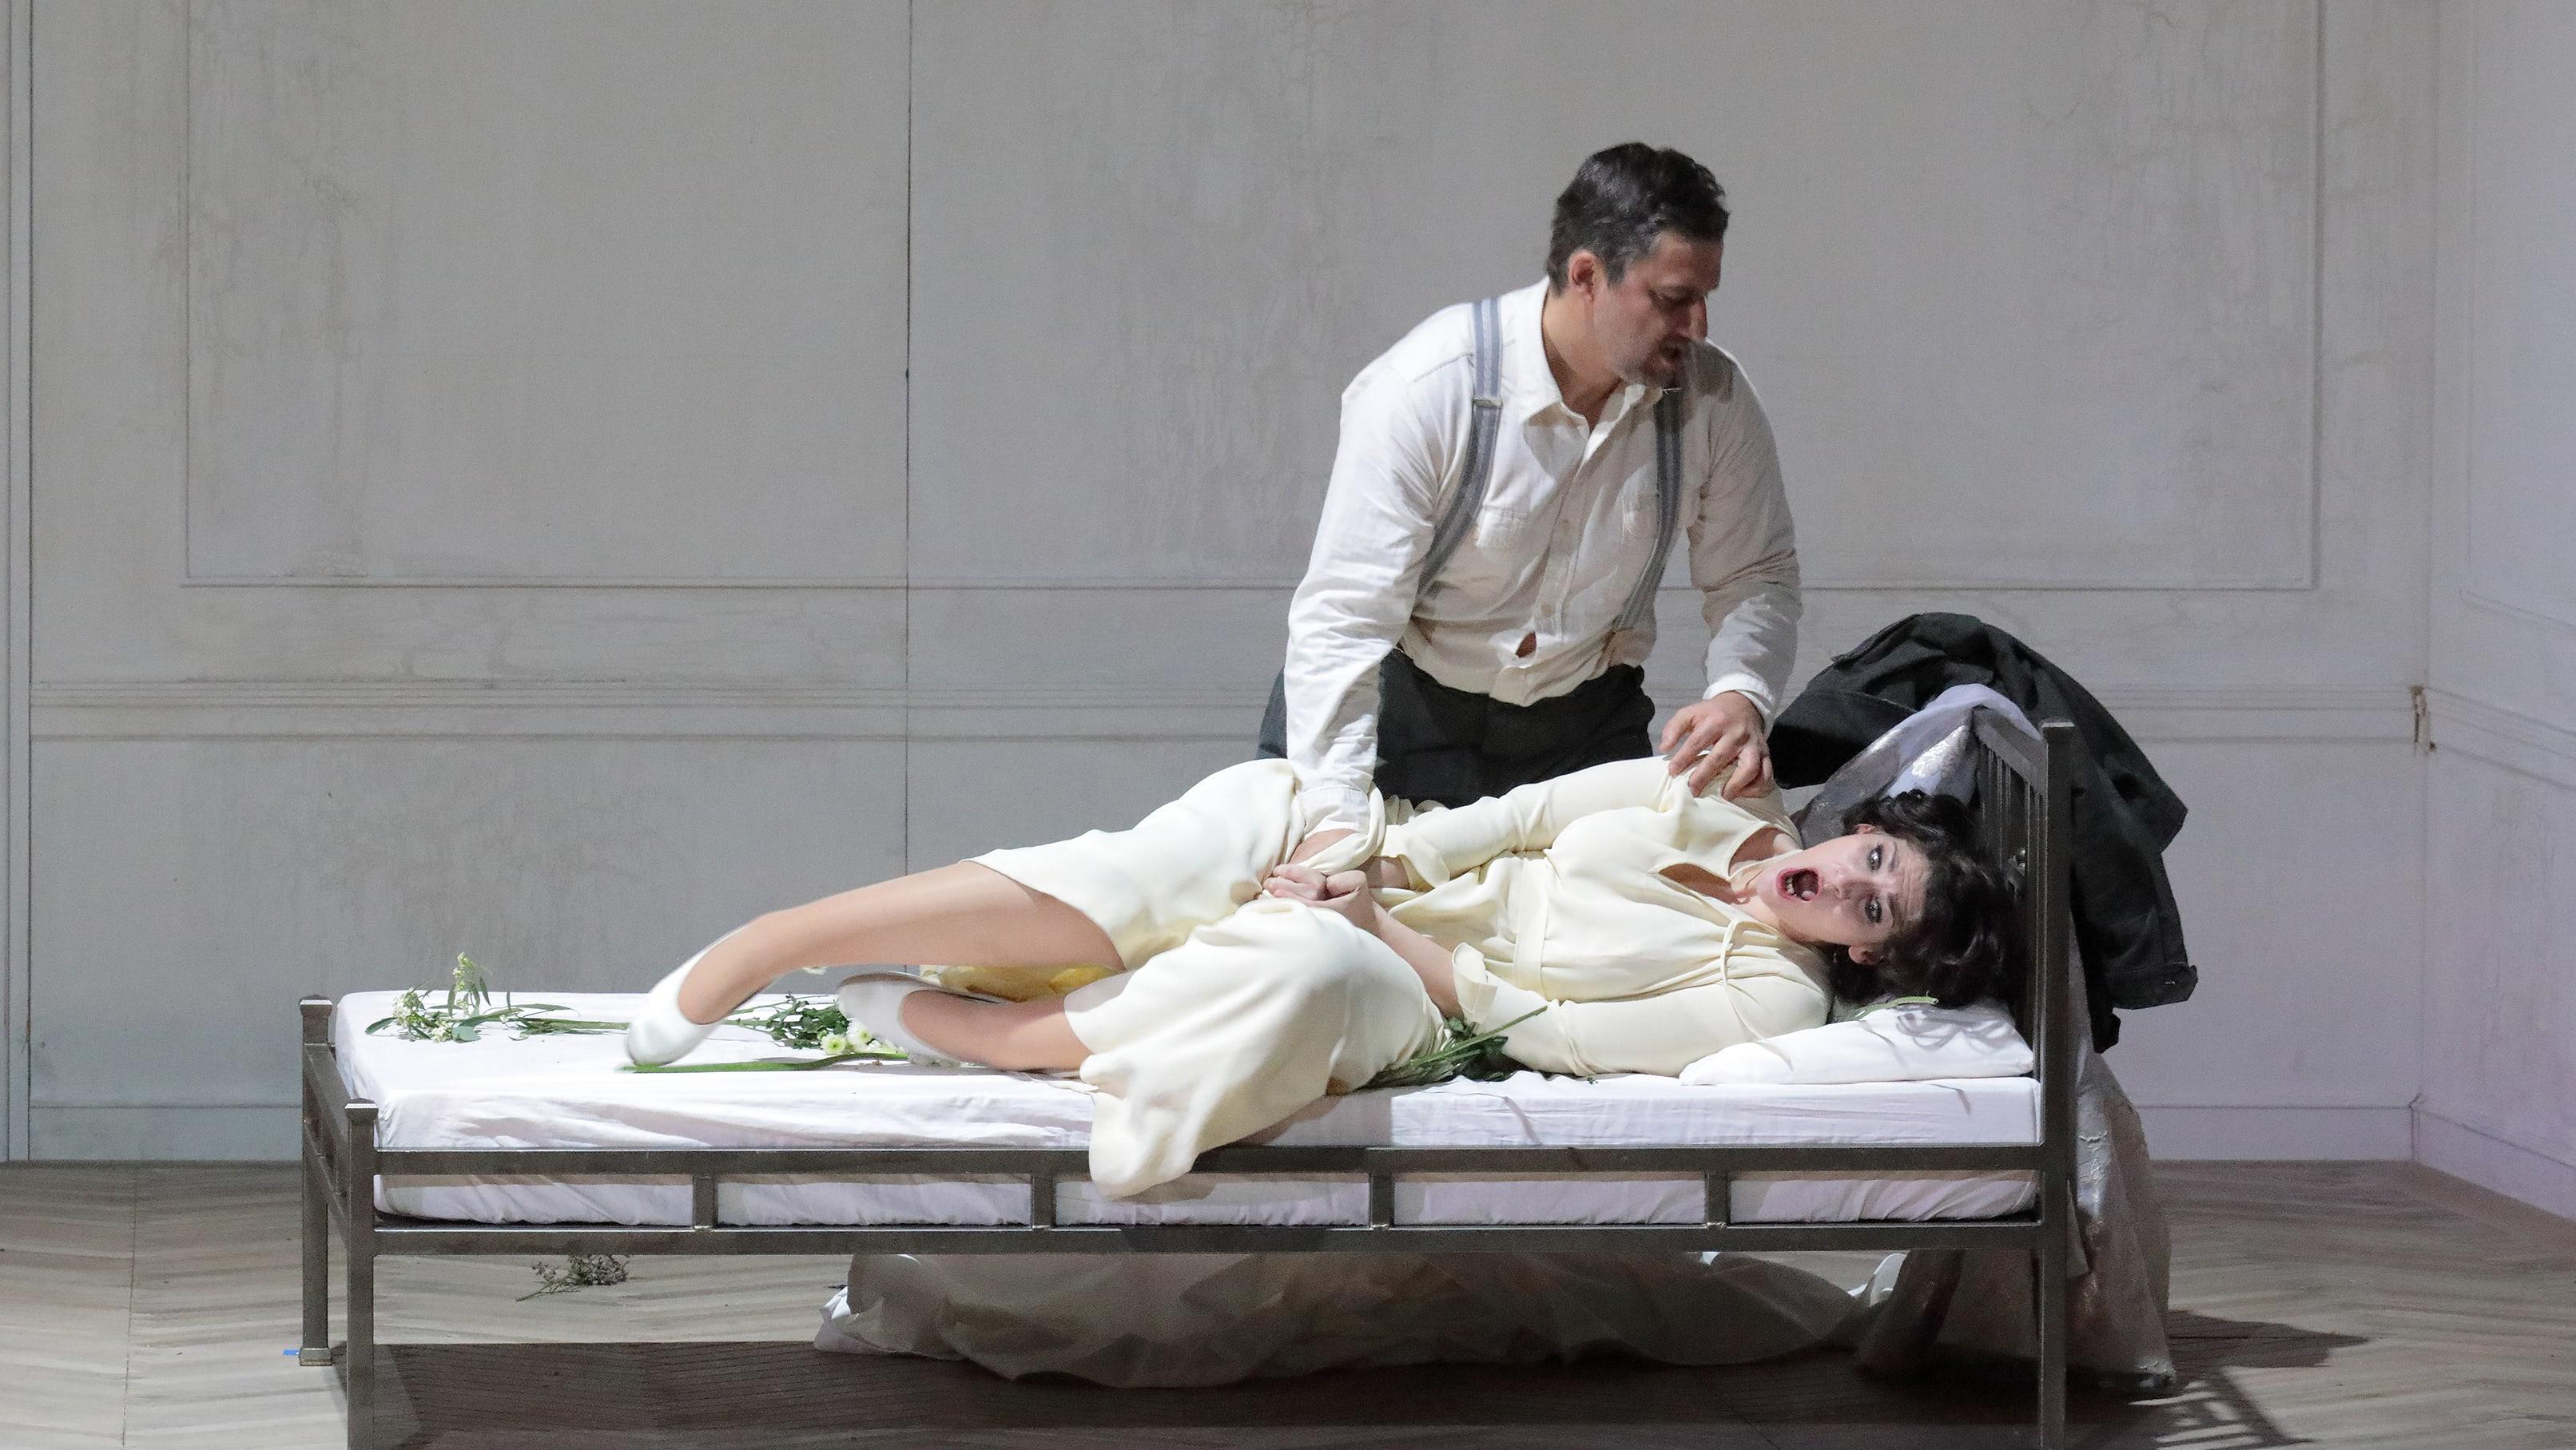 Verdin Ooppera